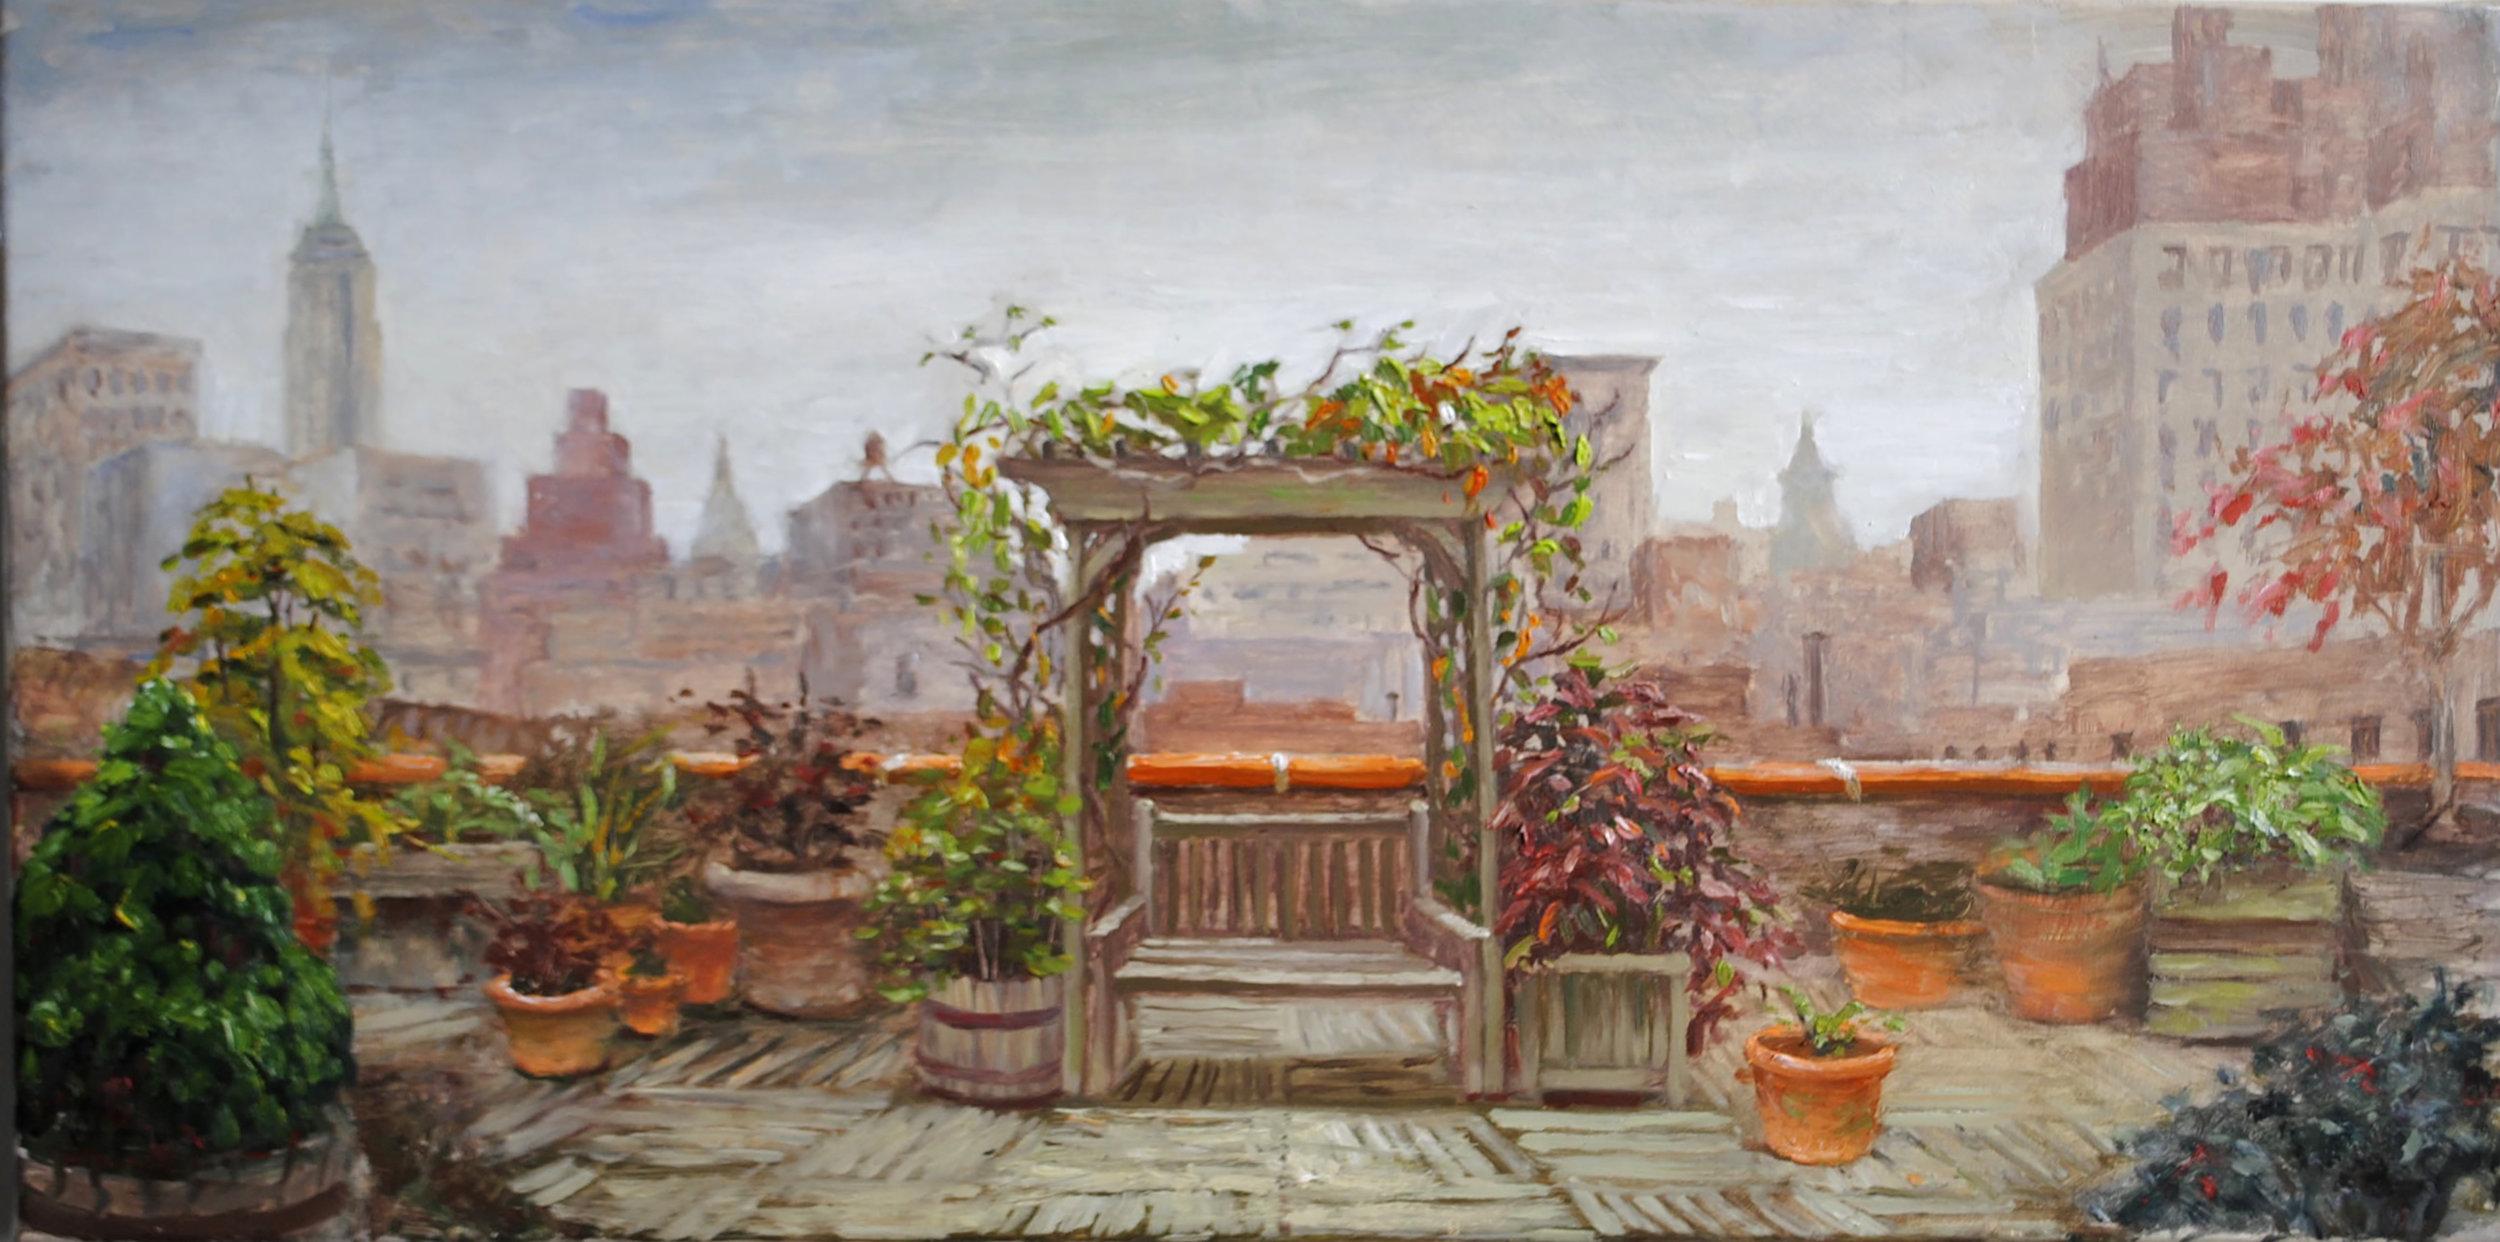 W-NITC-Rooftop Garden-Dalrymple-14x30-oil on canvas-2011-SOLD.jpg